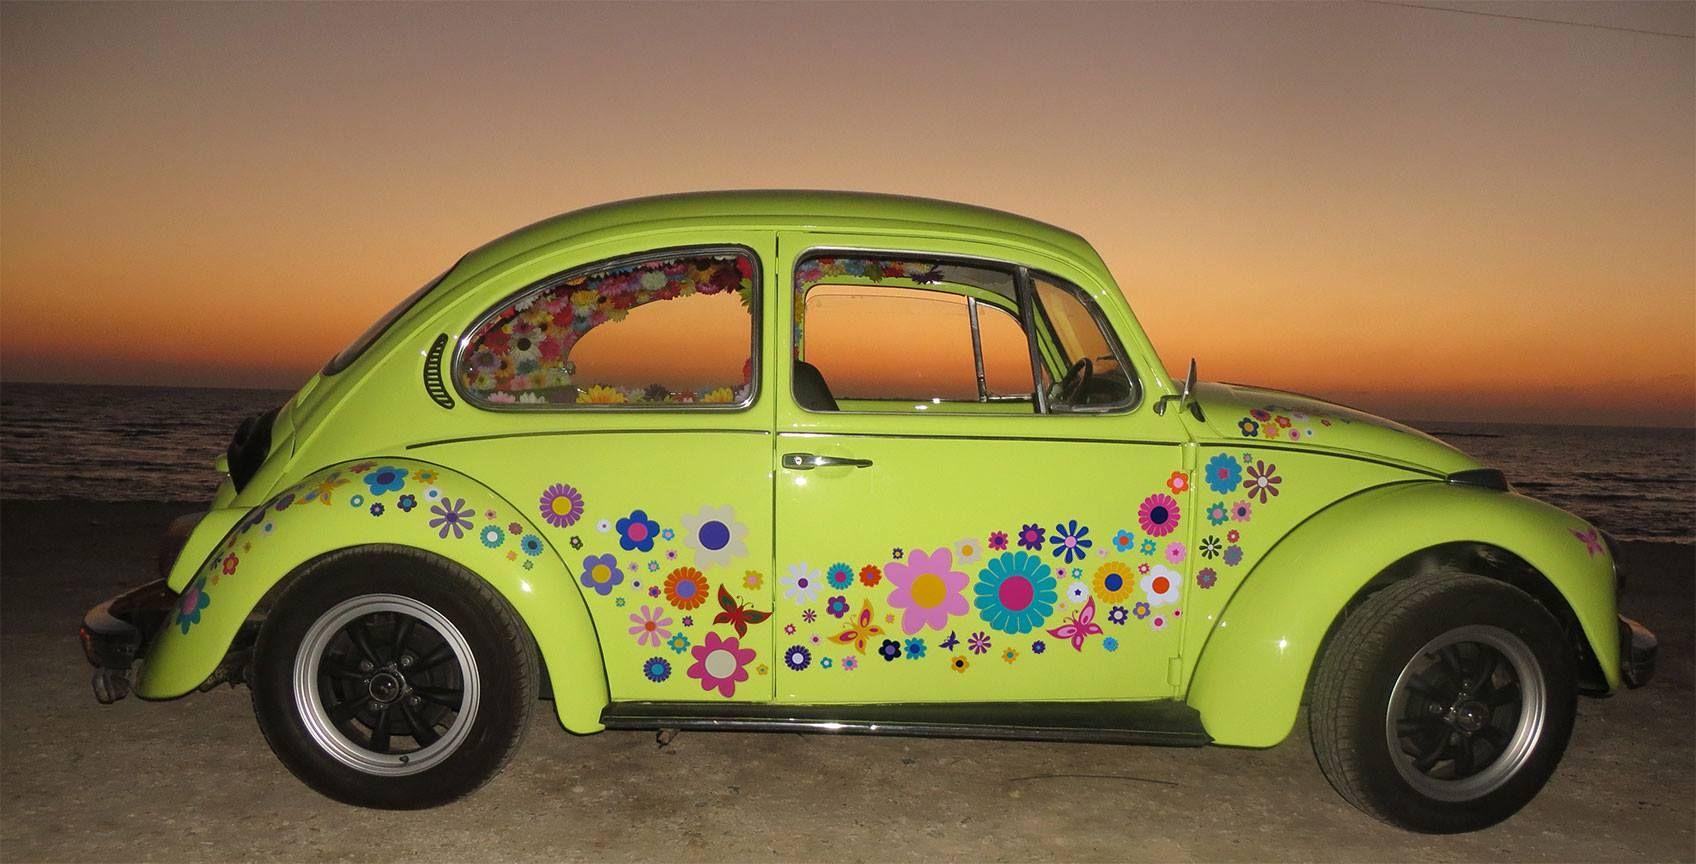 VW Beetle Flower Vinyl Car Stickers By Hippy Motors Httpwww - Custom vinyl car decals uk